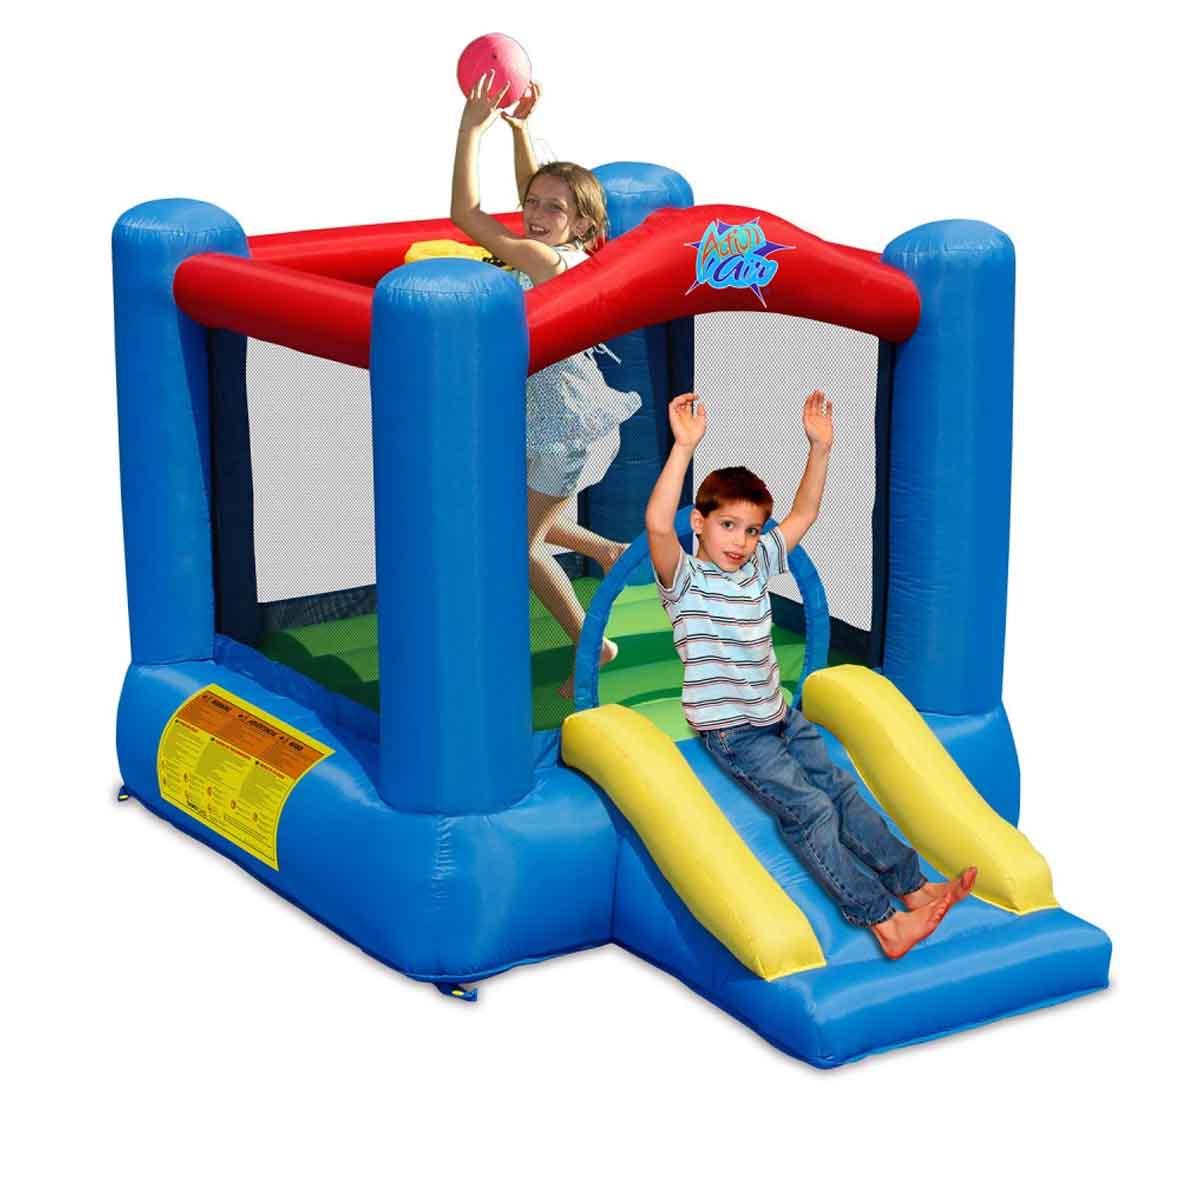 Castillo Brincolin Inflable De Fiestas Para Niños Game Power